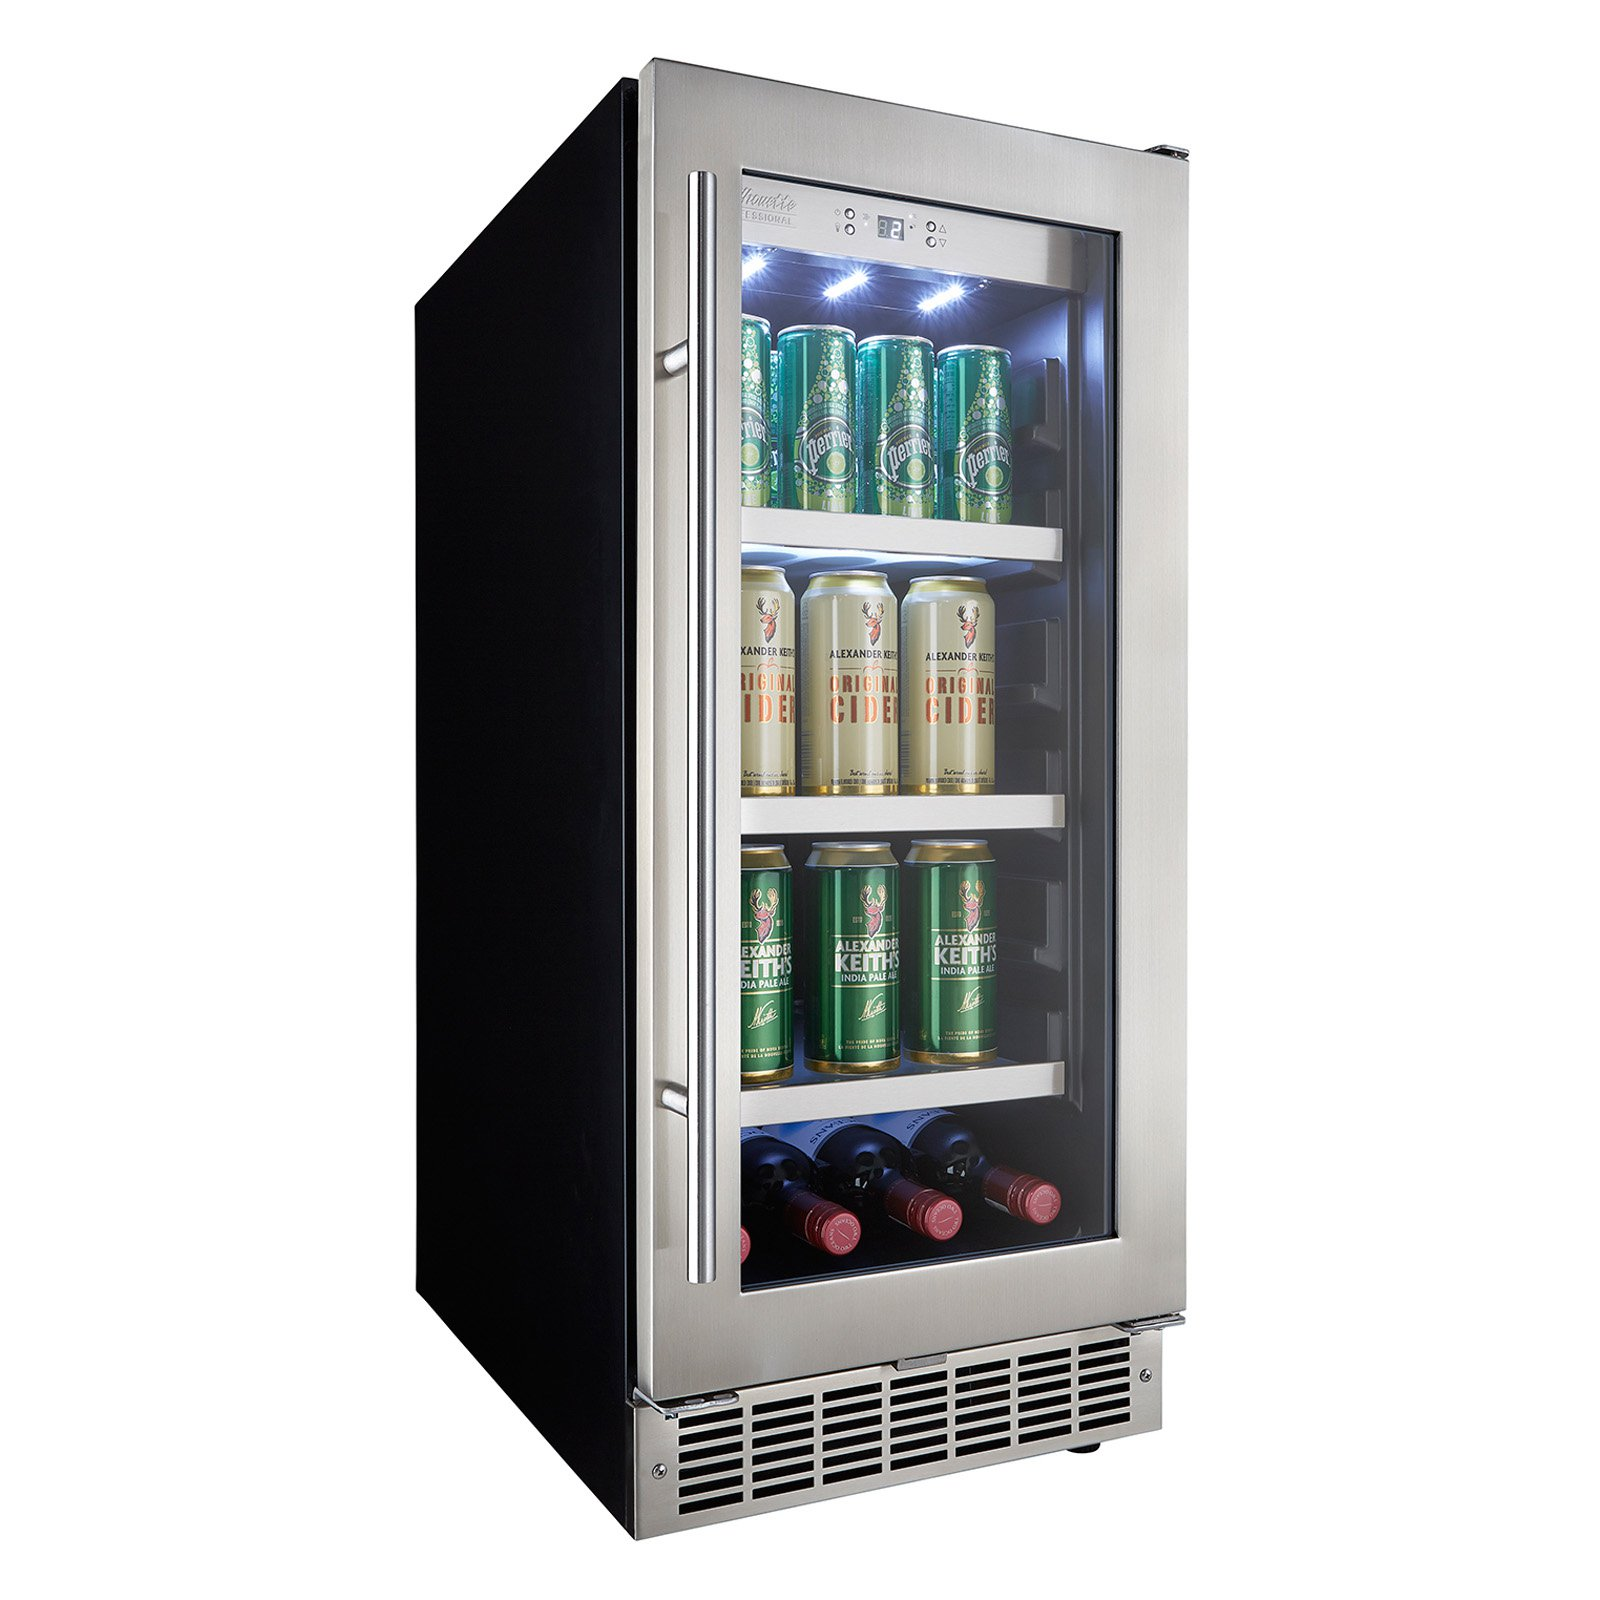 Silhouette Professional 3.1 cu. ft. Built-In Beverage Center